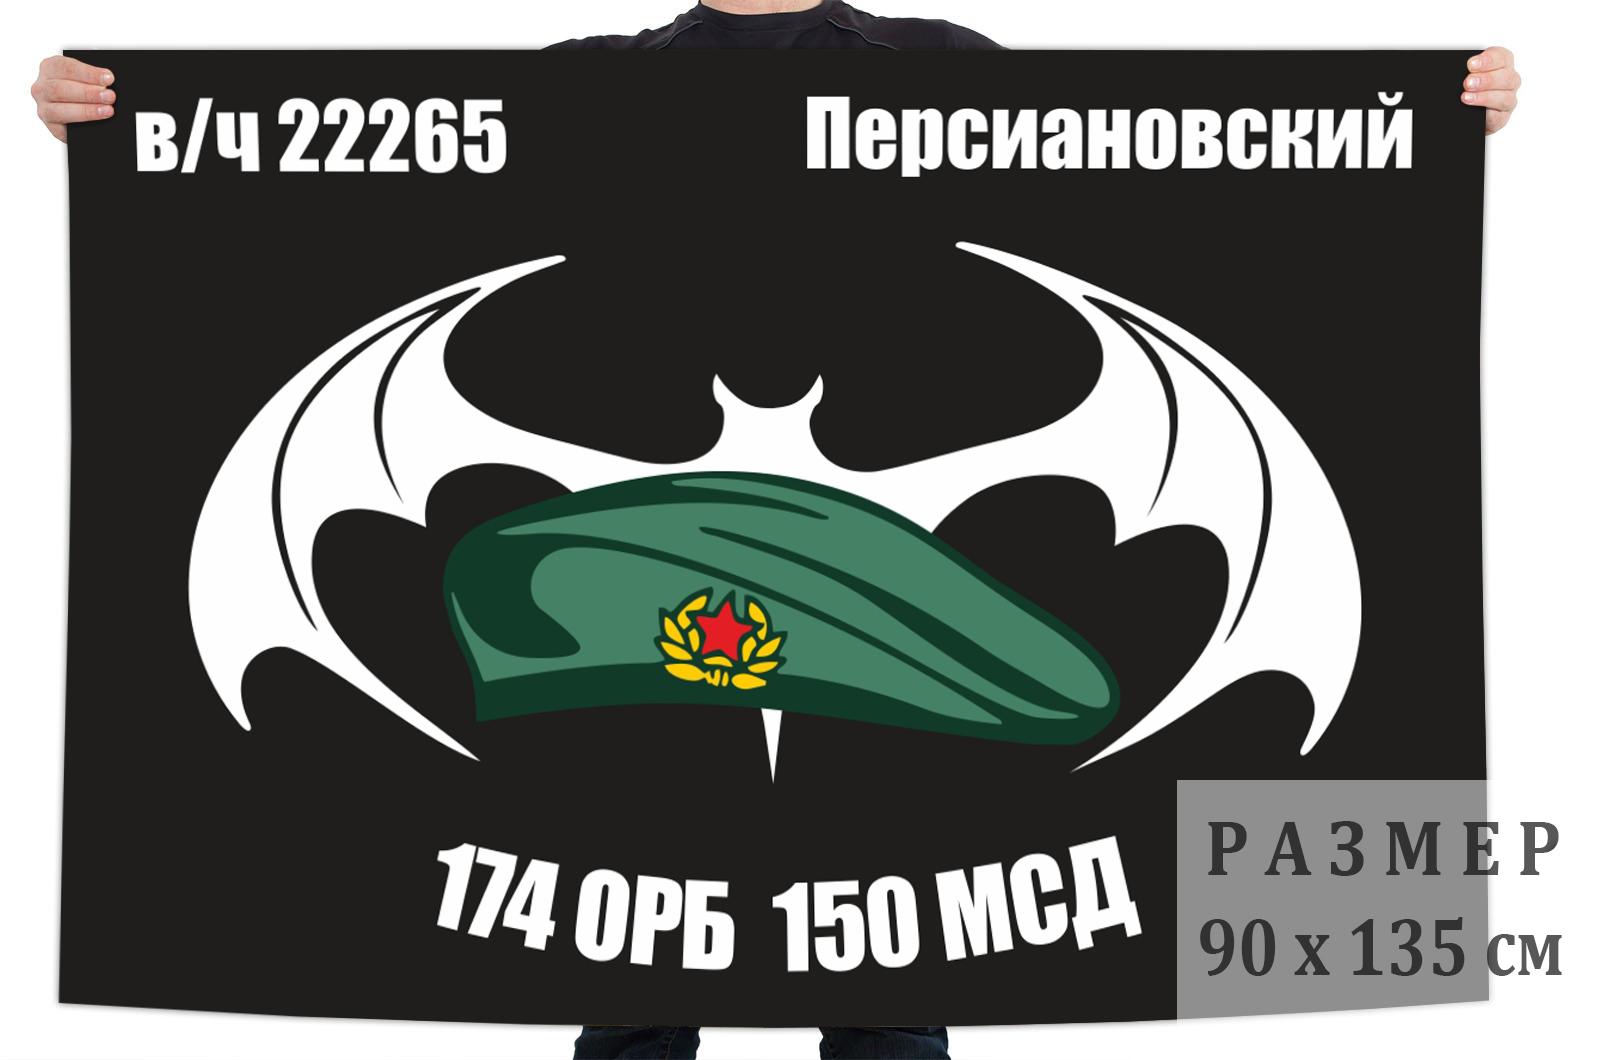 Флаг 174 ОРБ 150 МСД